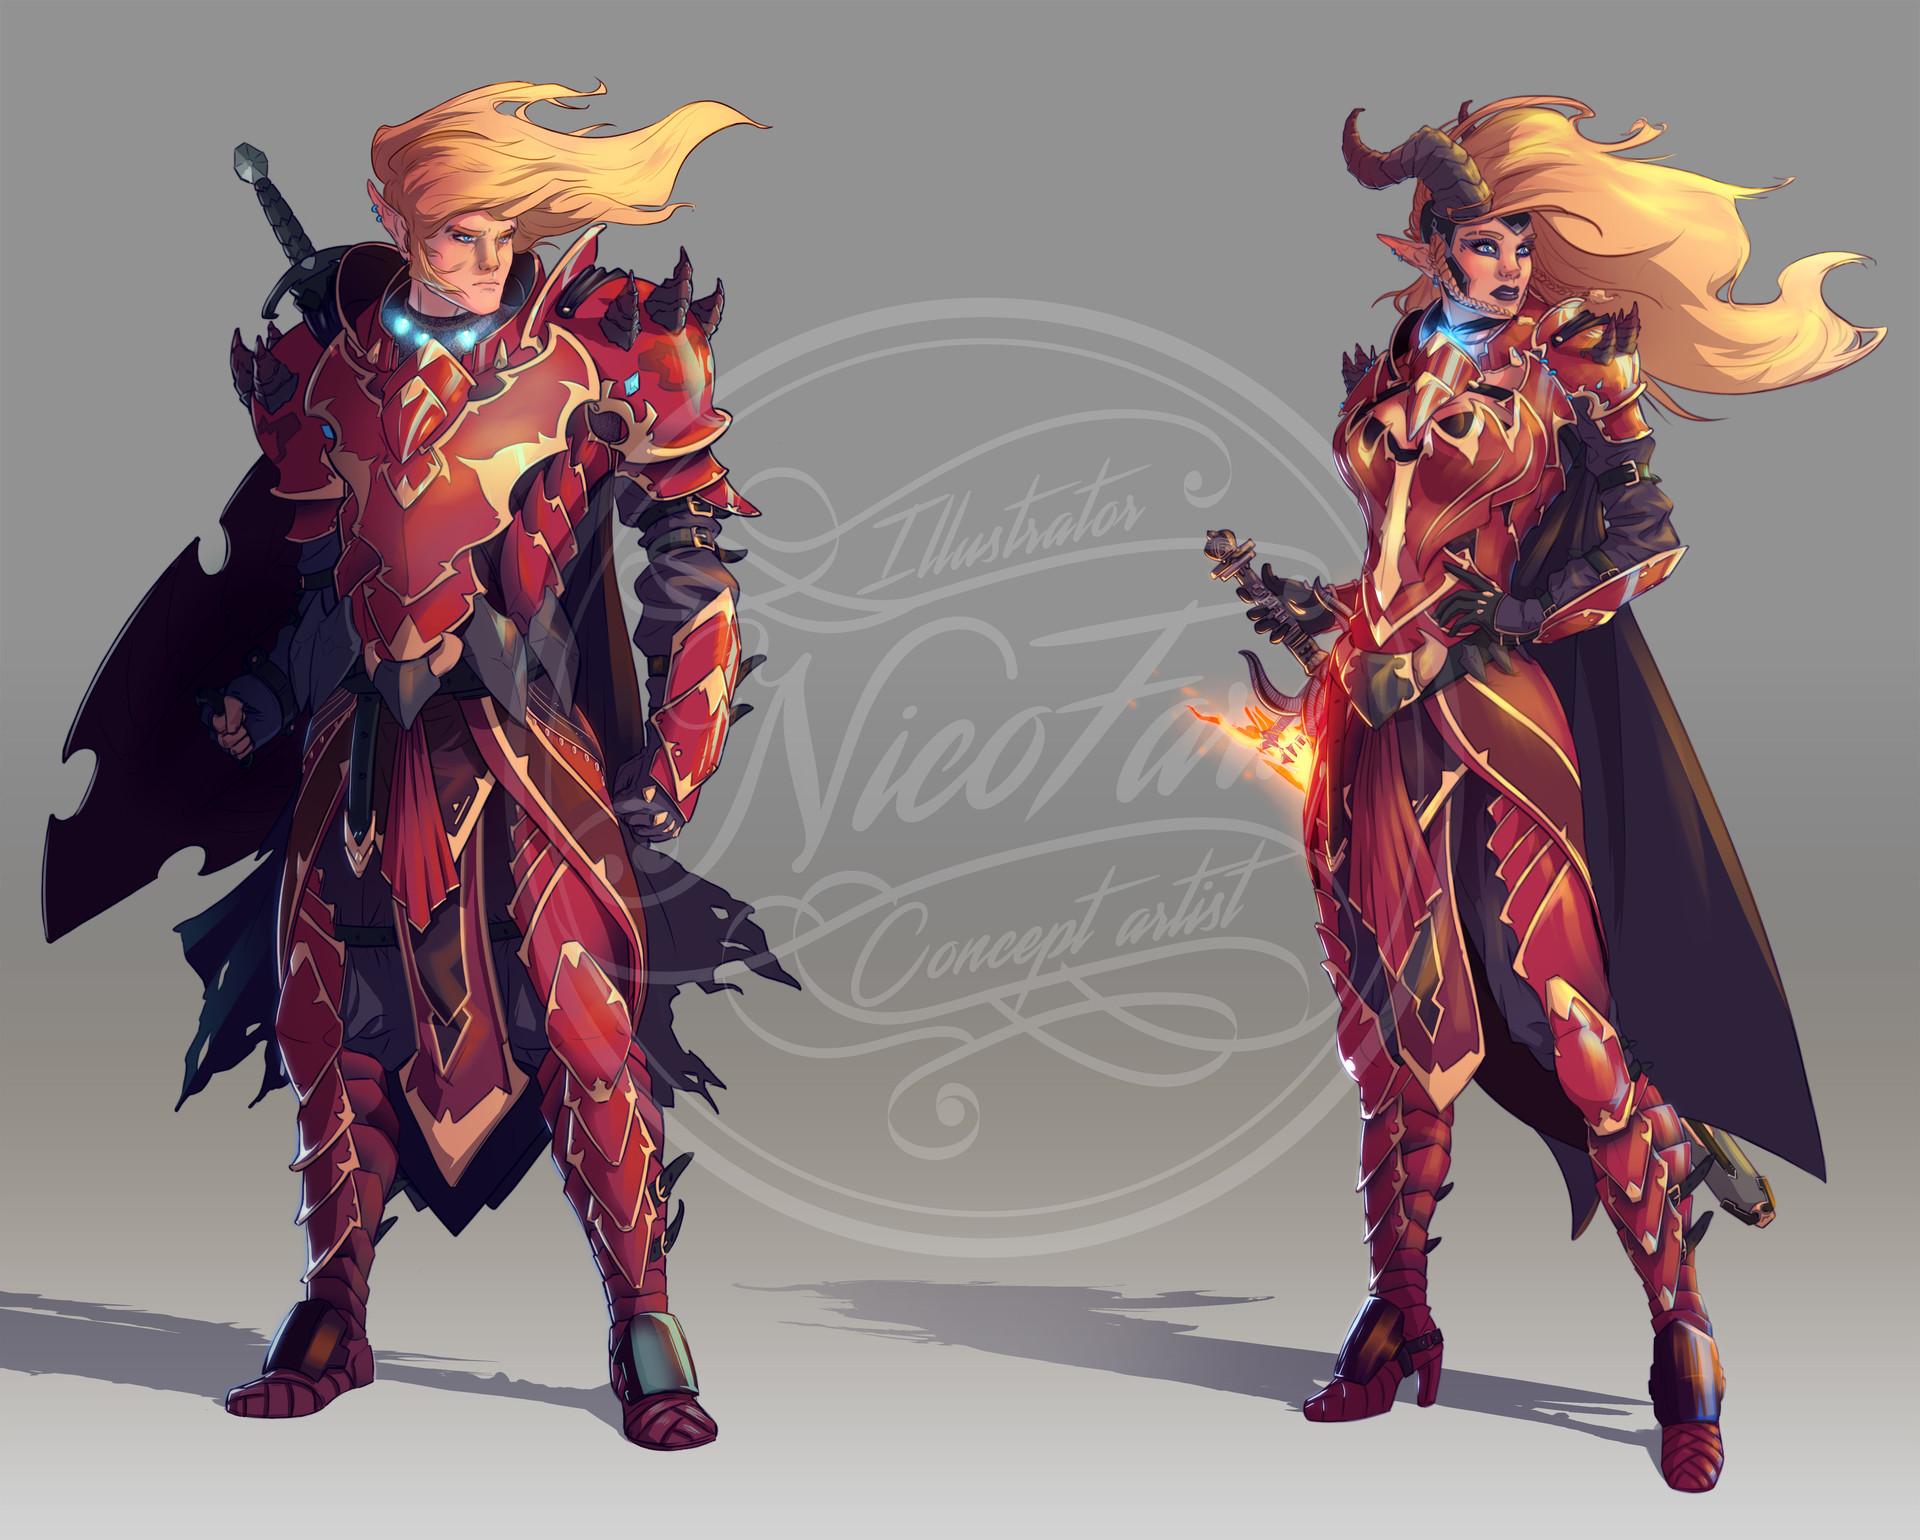 Nico fari characterdesign2